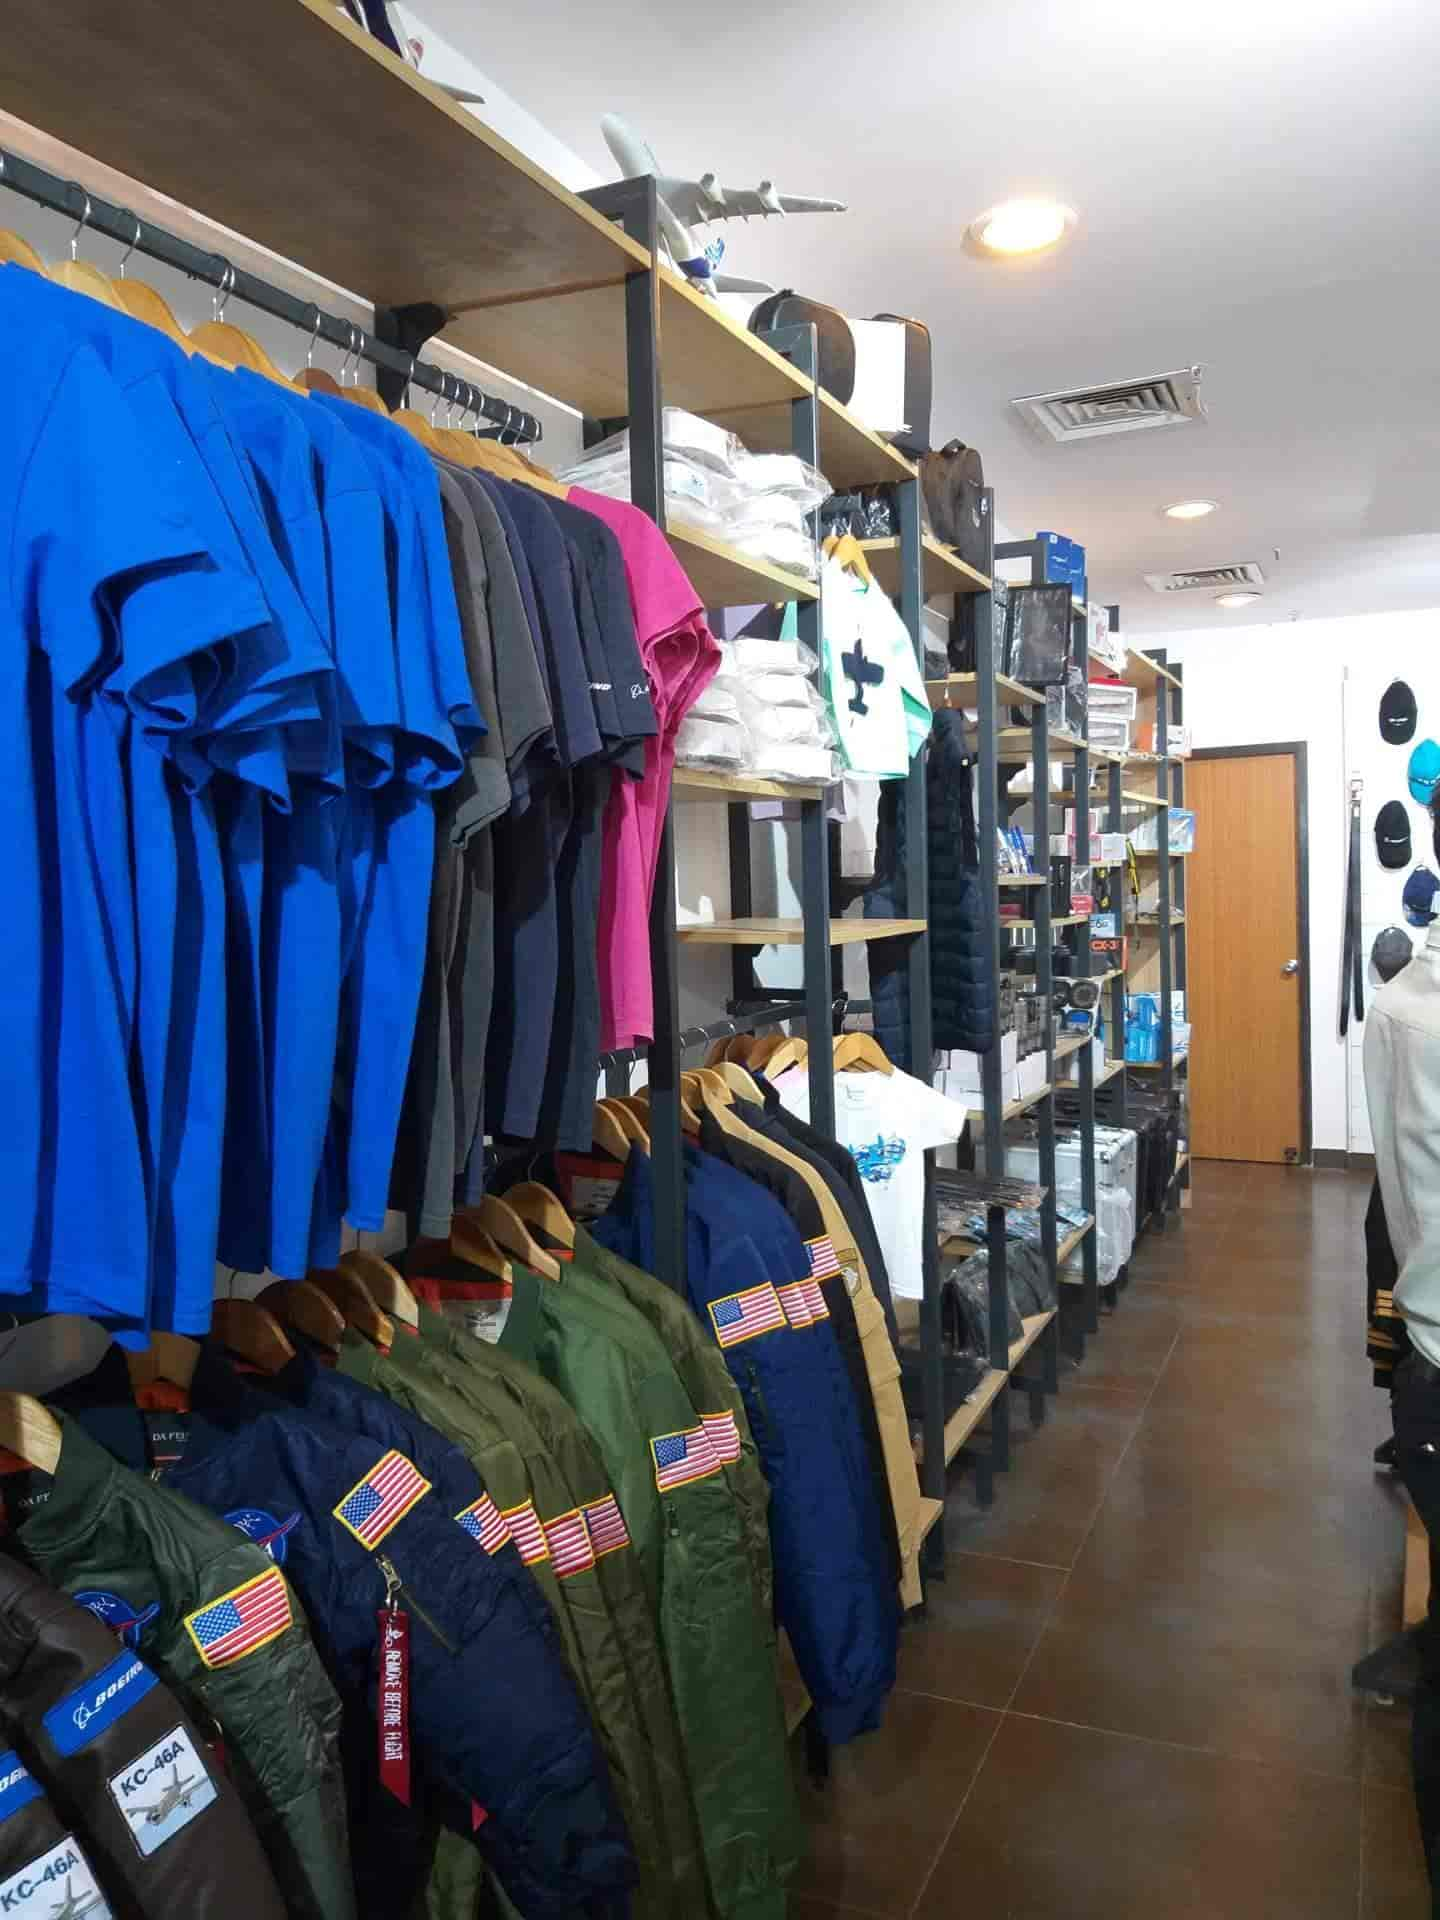 Mach 9 The Pilot Shop, Gurgaon - T Shirt Retailers in Delhi